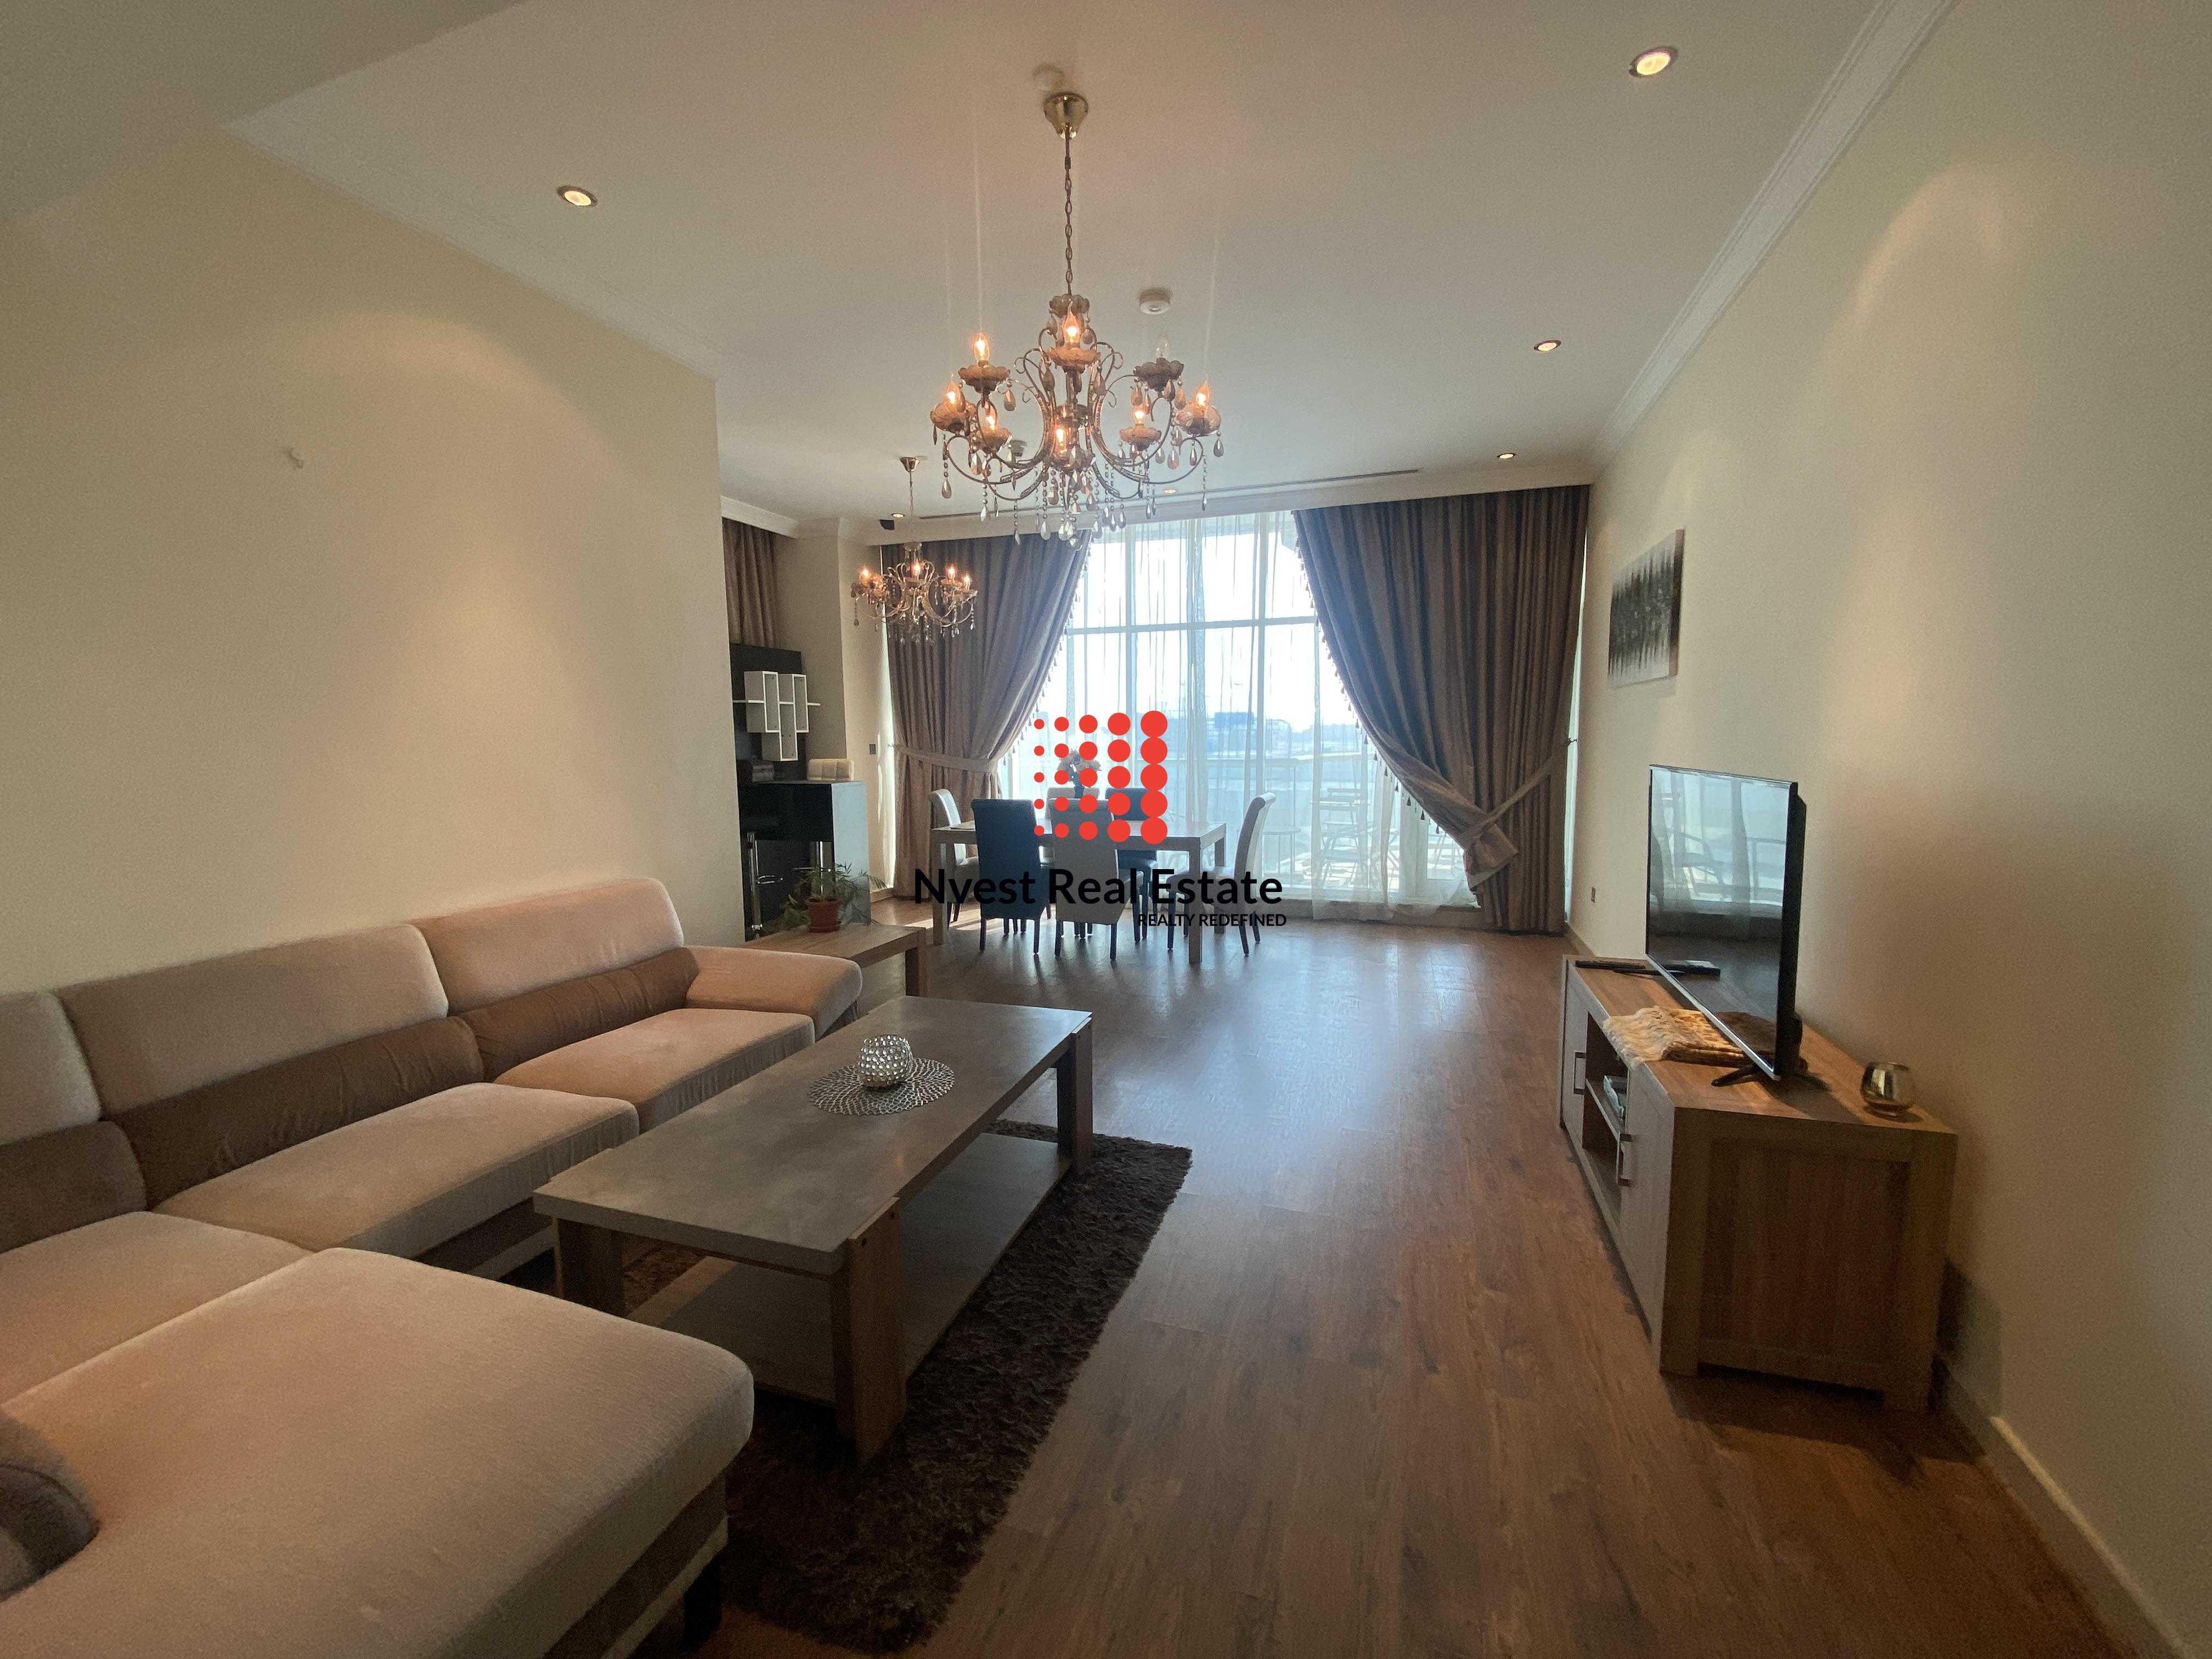 Fully Furnished 2 Bedroom-Huge Balcony-Trident Waterfront Dubai Marina